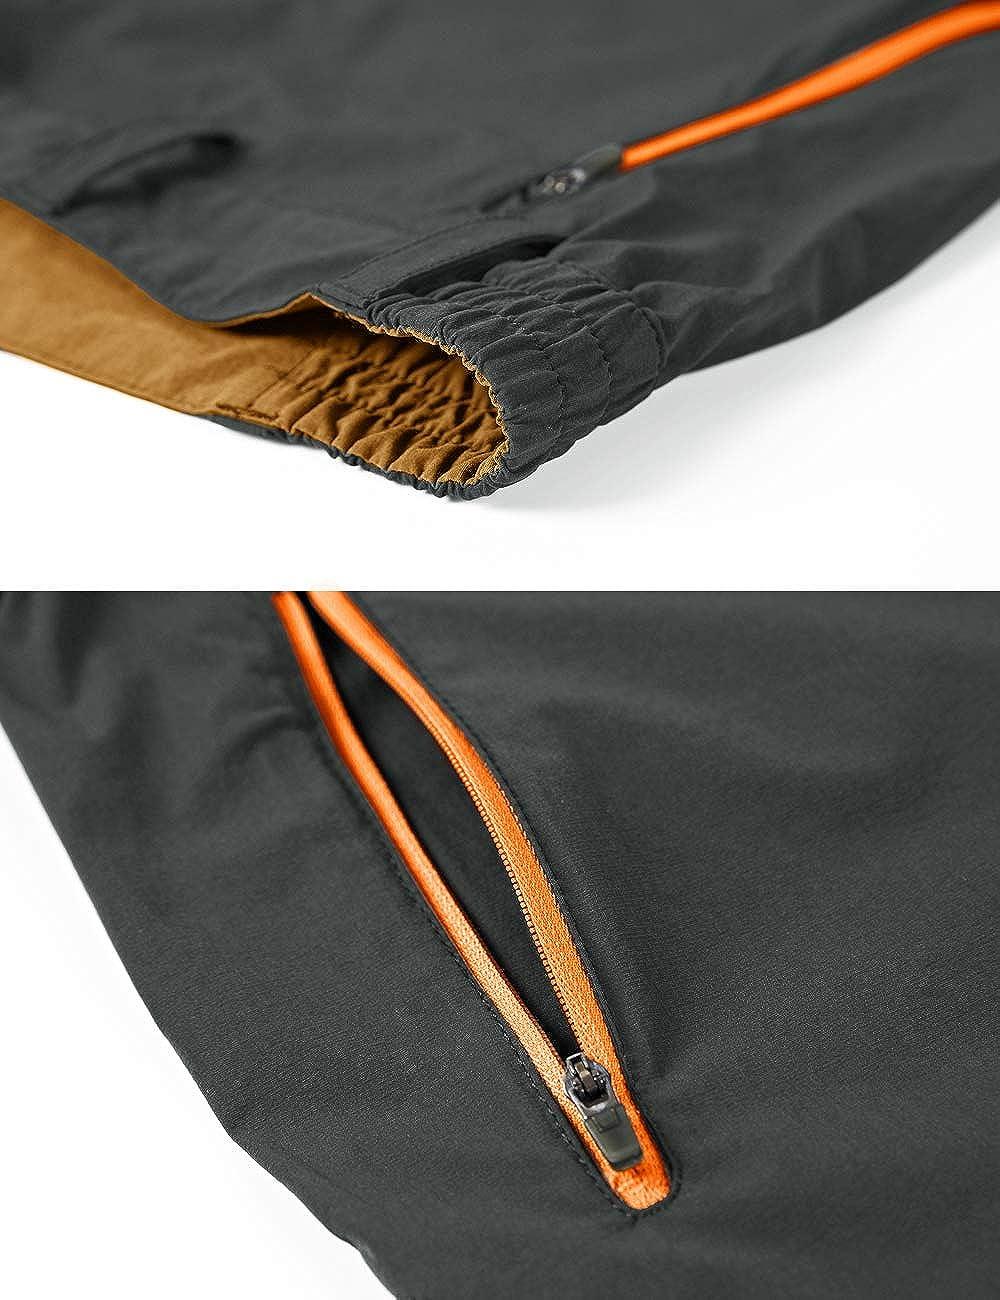 EKLENTSON Mens Outdoor Stretch Waist Thin Quick Drying Shorts Lightweight Slim Fit Cargo Shorts No Belt